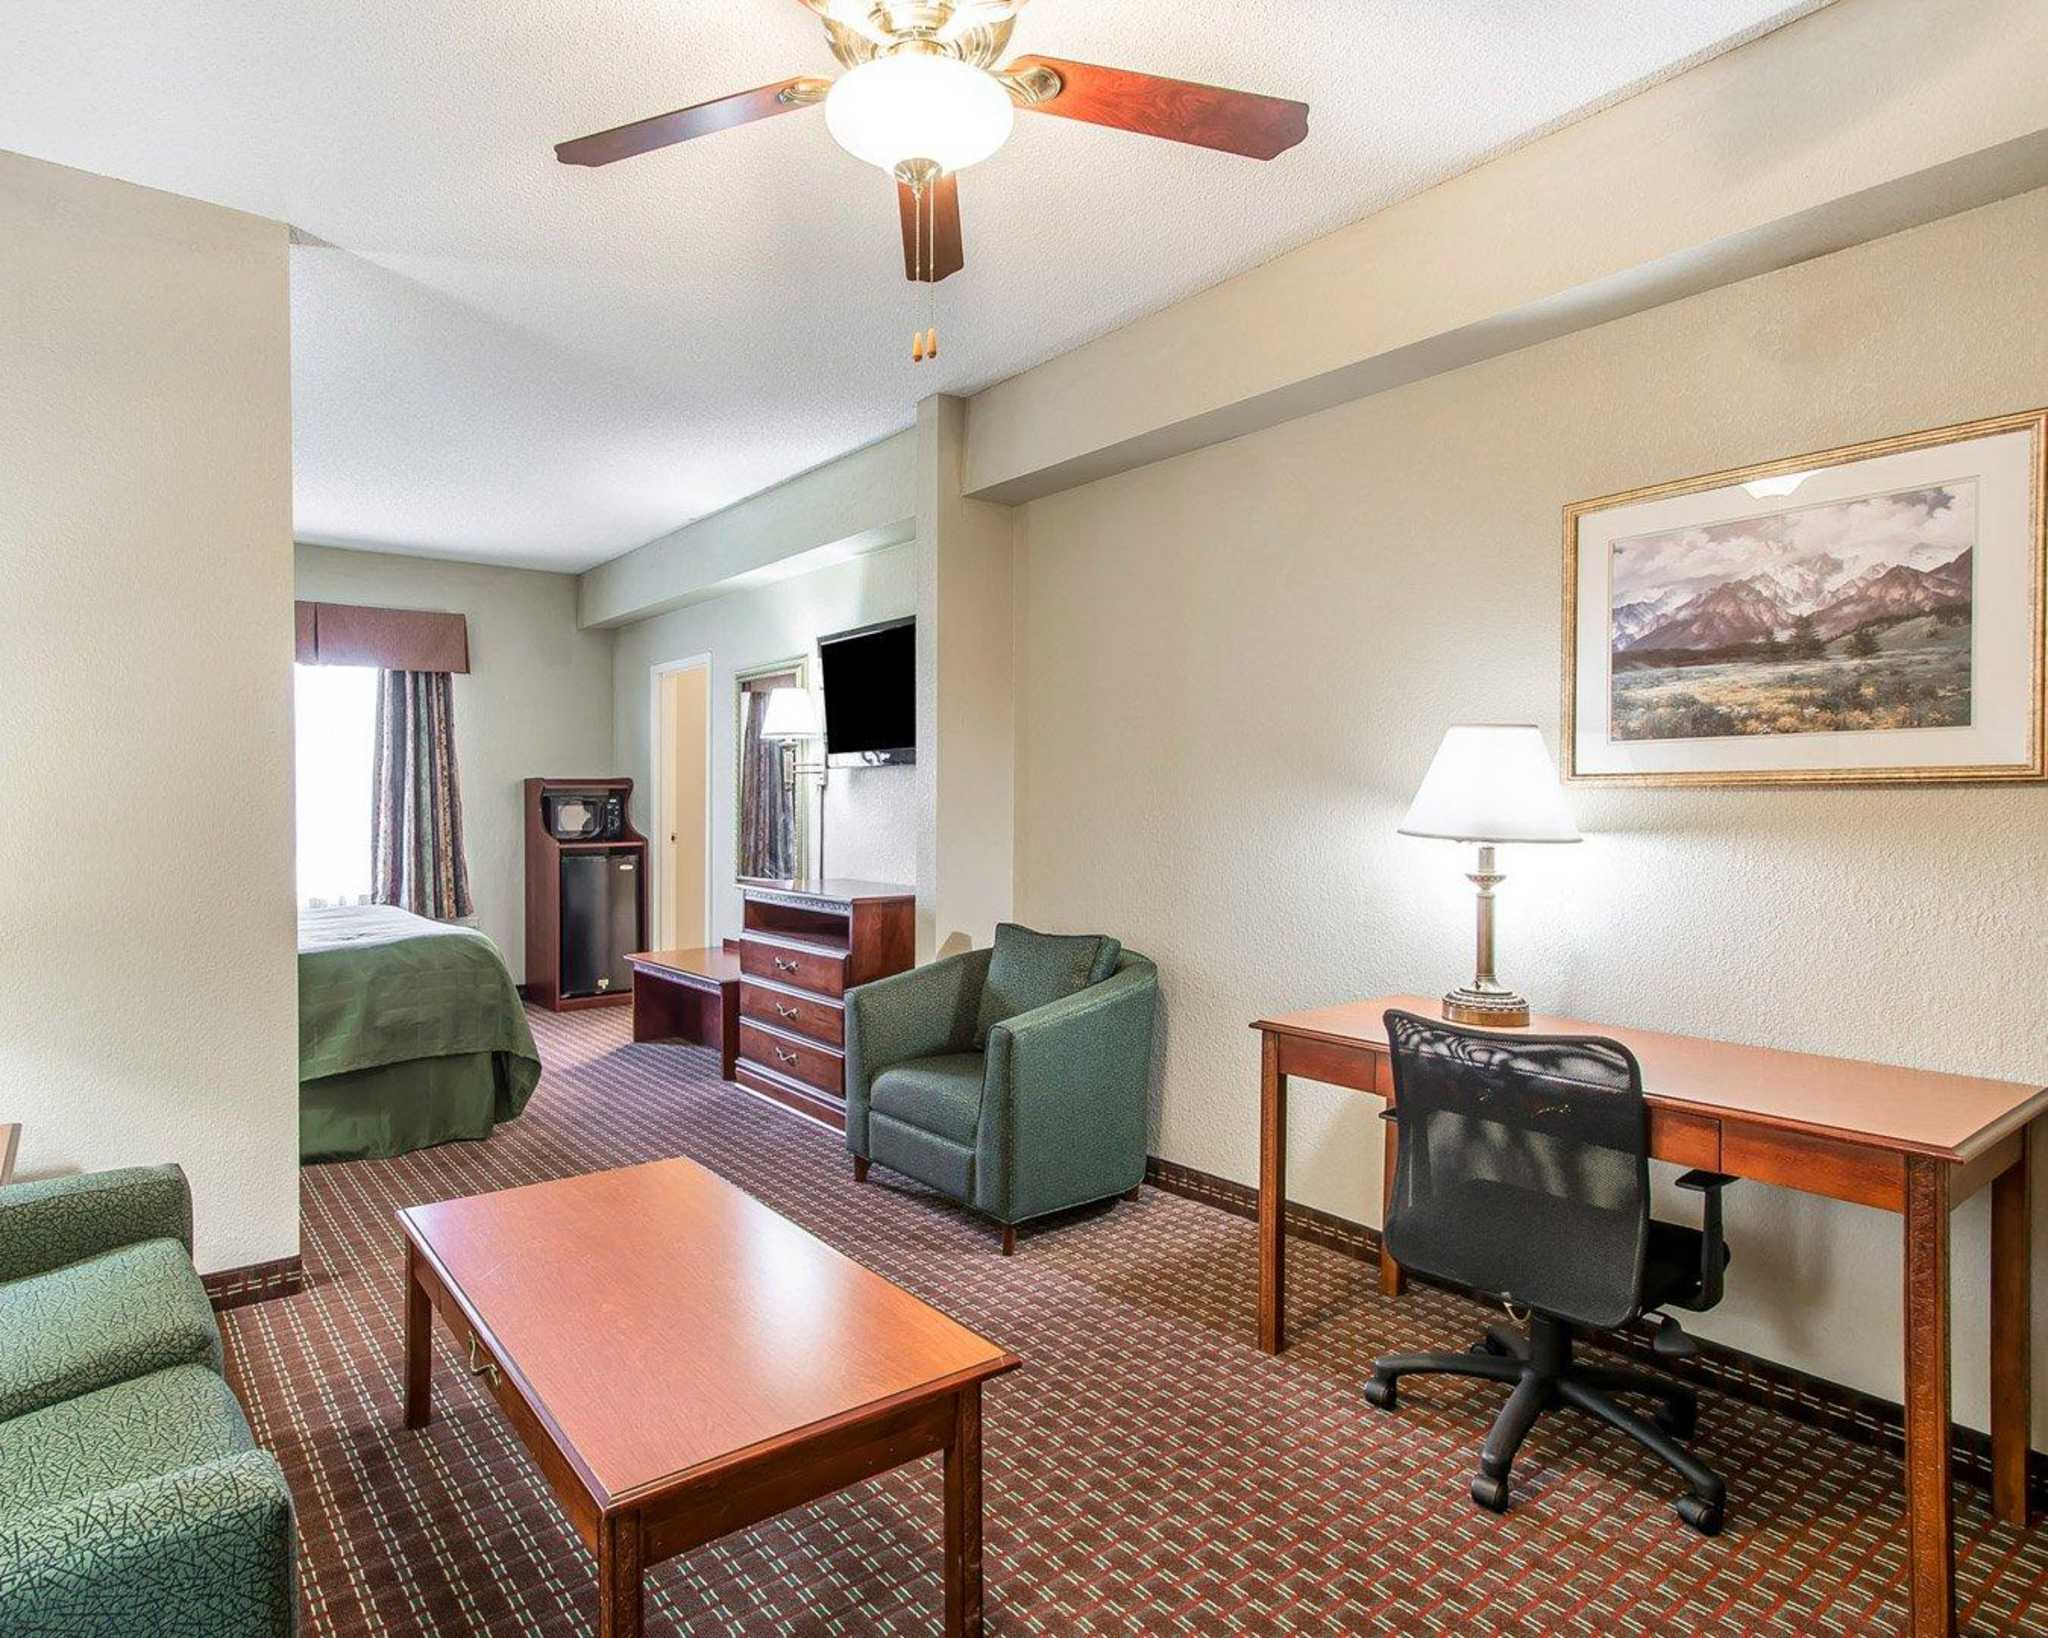 Hotels In Thomasville Al Area